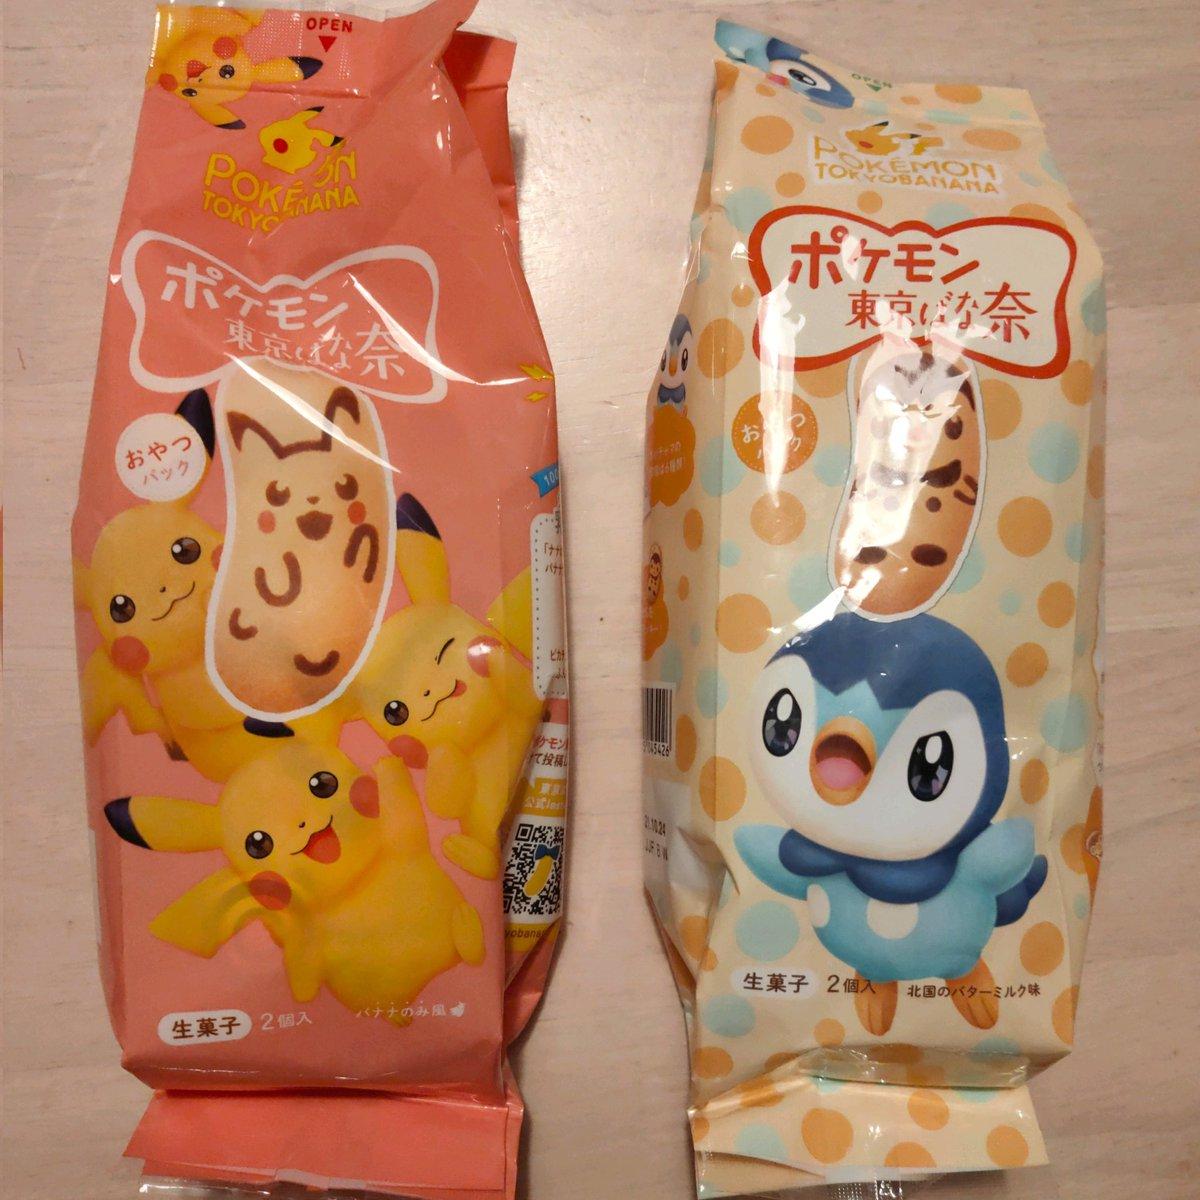 test ツイッターメディア - 後輩が東京のお土産買ってきてくれた😁 他のメンバーにはごまたまごで、俺だけポケモン東京ばな奈😂 さすが分かっとるね🤣✨www ポッチャマのバターミルク味食べたかったから嬉しいわぁ🥺✨✨✨ #ポケモン  #東京ばな奈  #ピカチュウ  #ポッチャマ https://t.co/v42FR98gKz